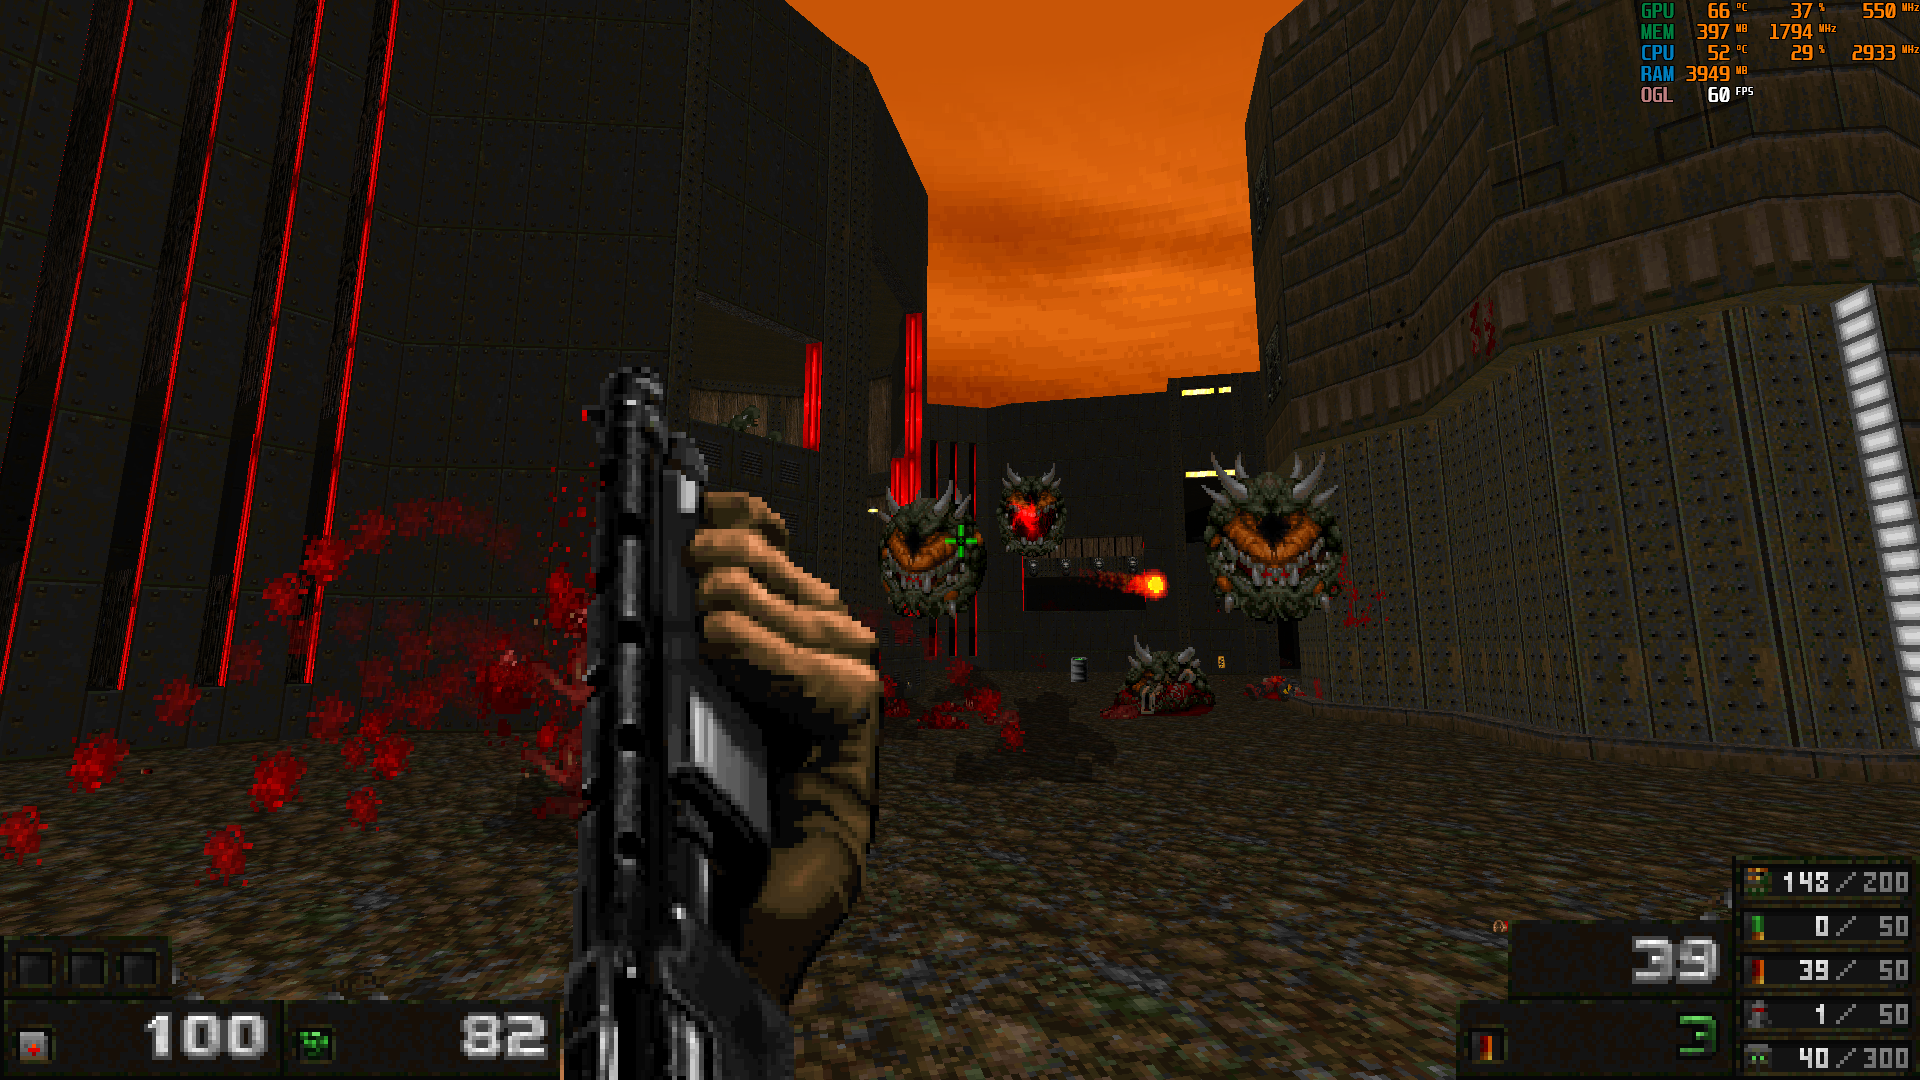 Screenshot_Doom_20190929_215939.png.ec9d87c5b5015424eea41a724444ae31.png